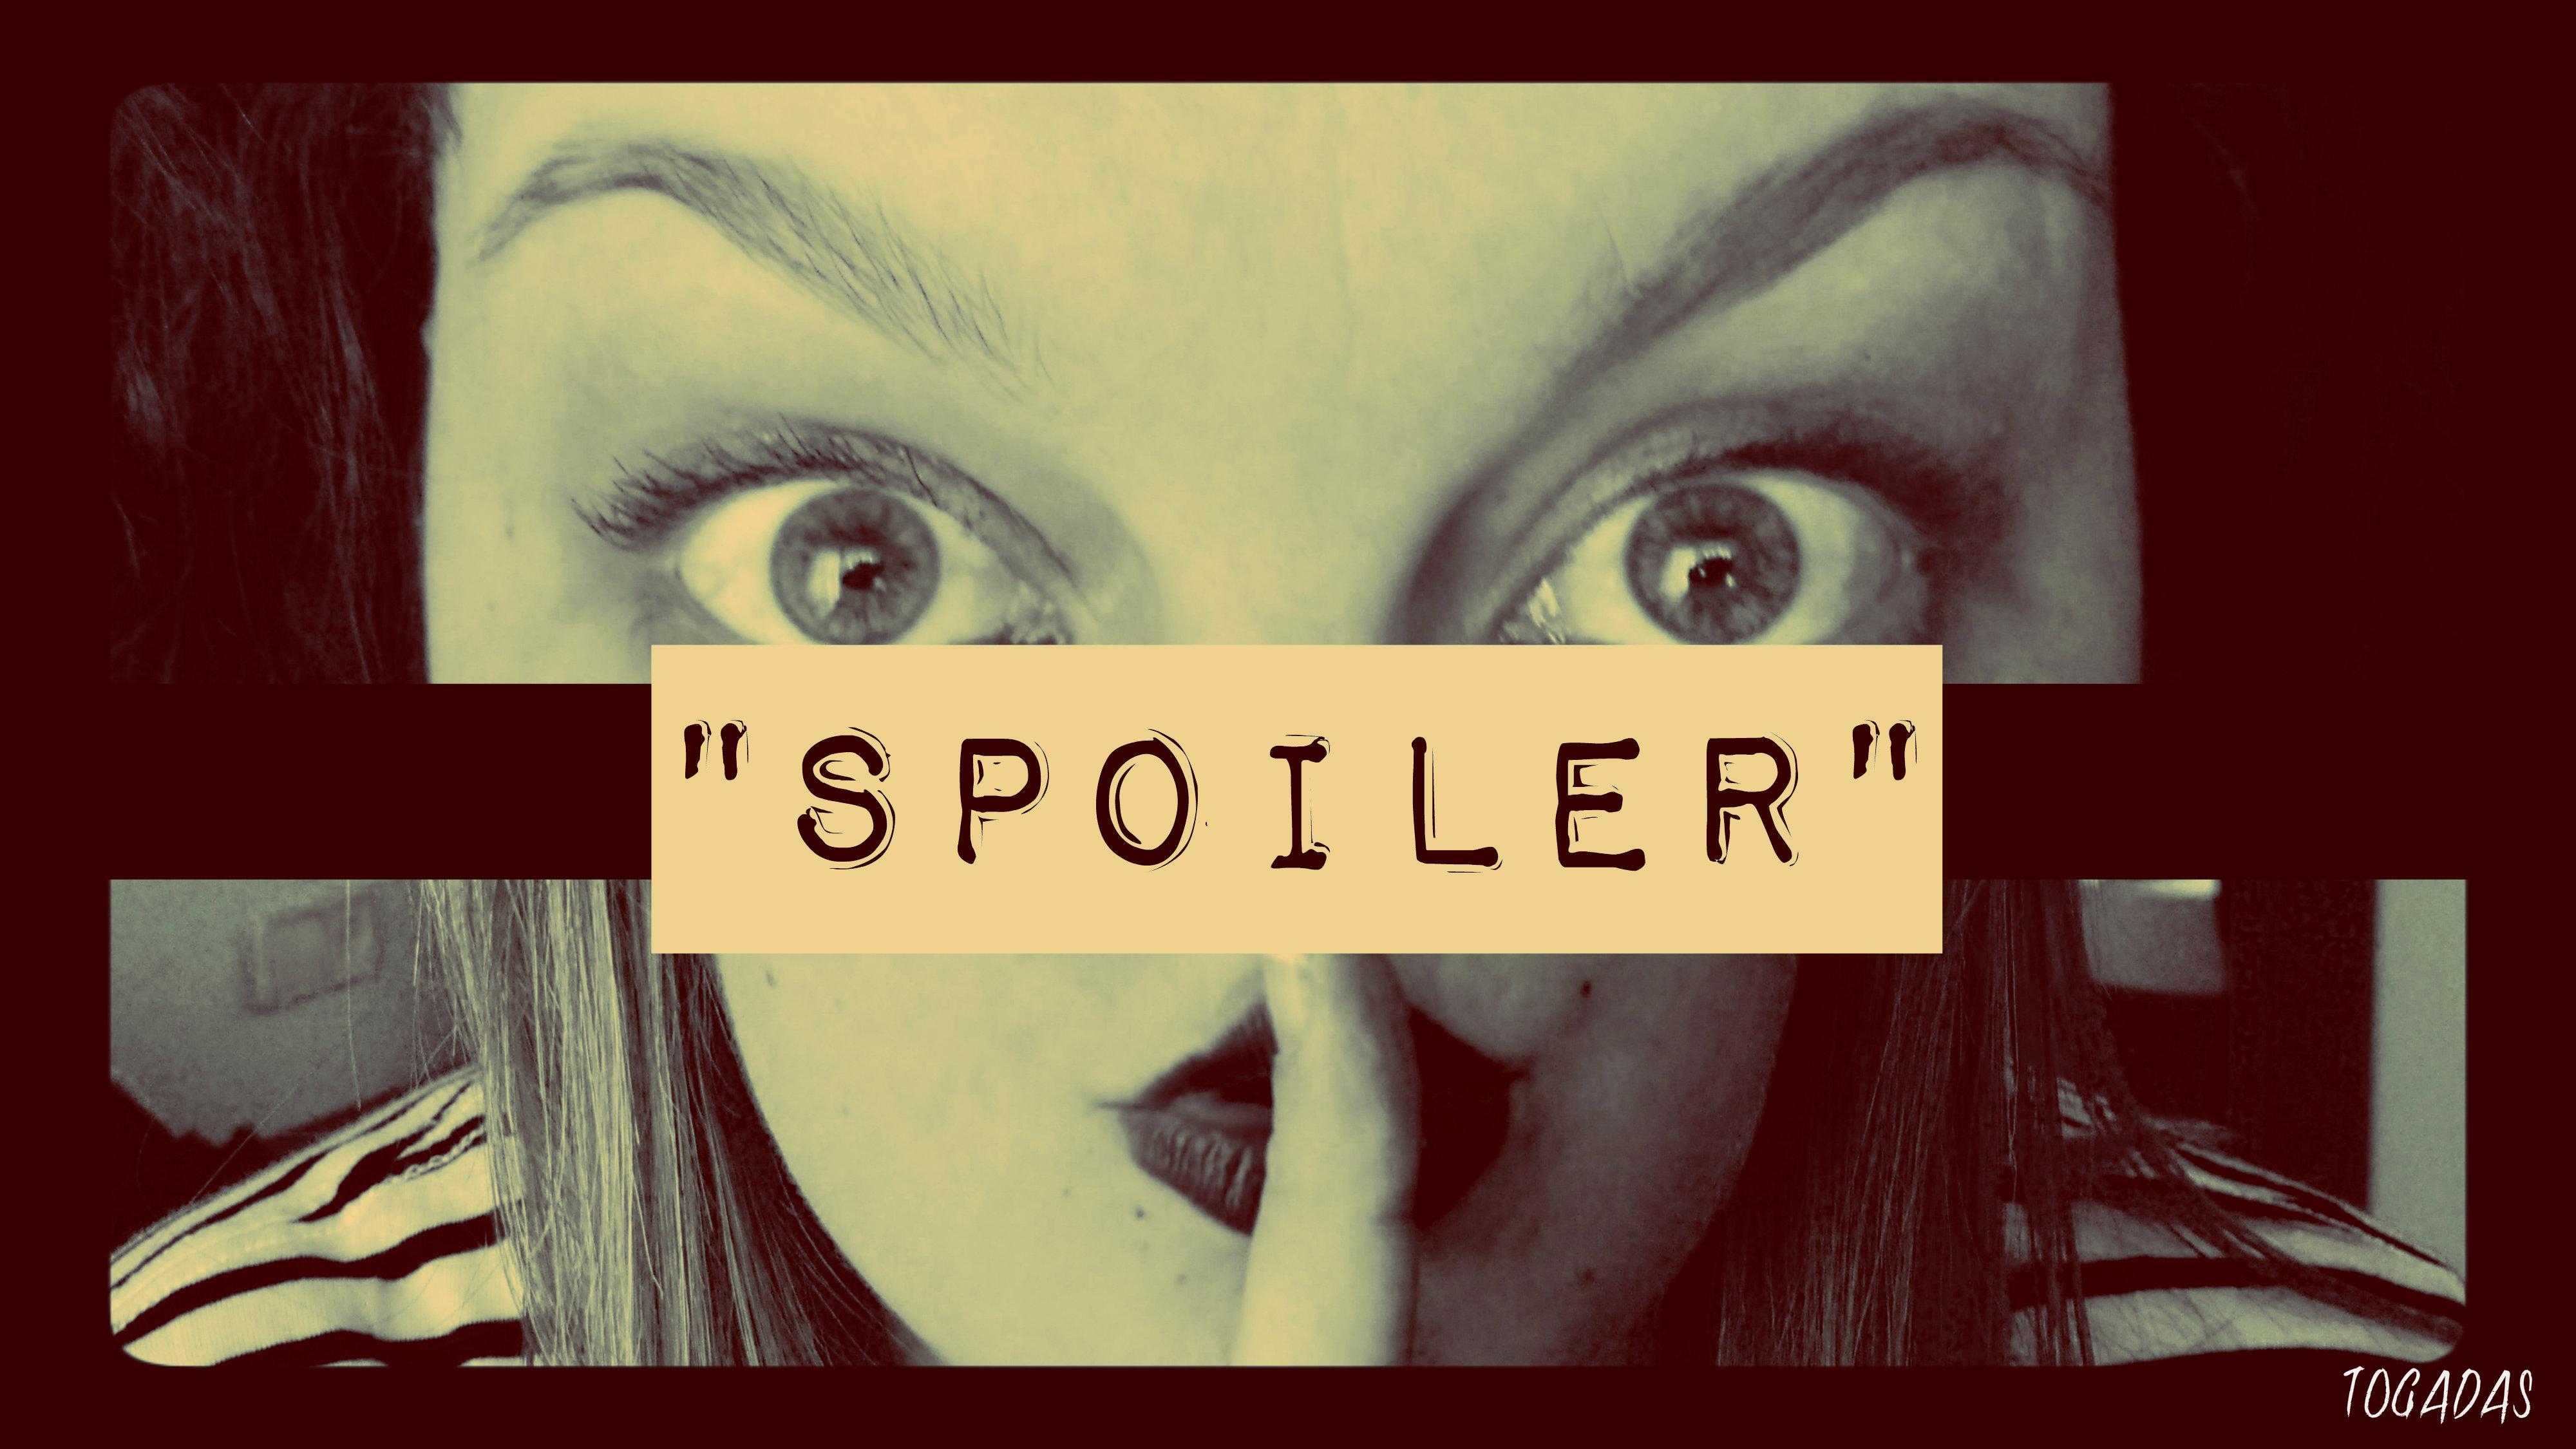 SpoilerFINAL-Togadas-junio16-letrados.diego